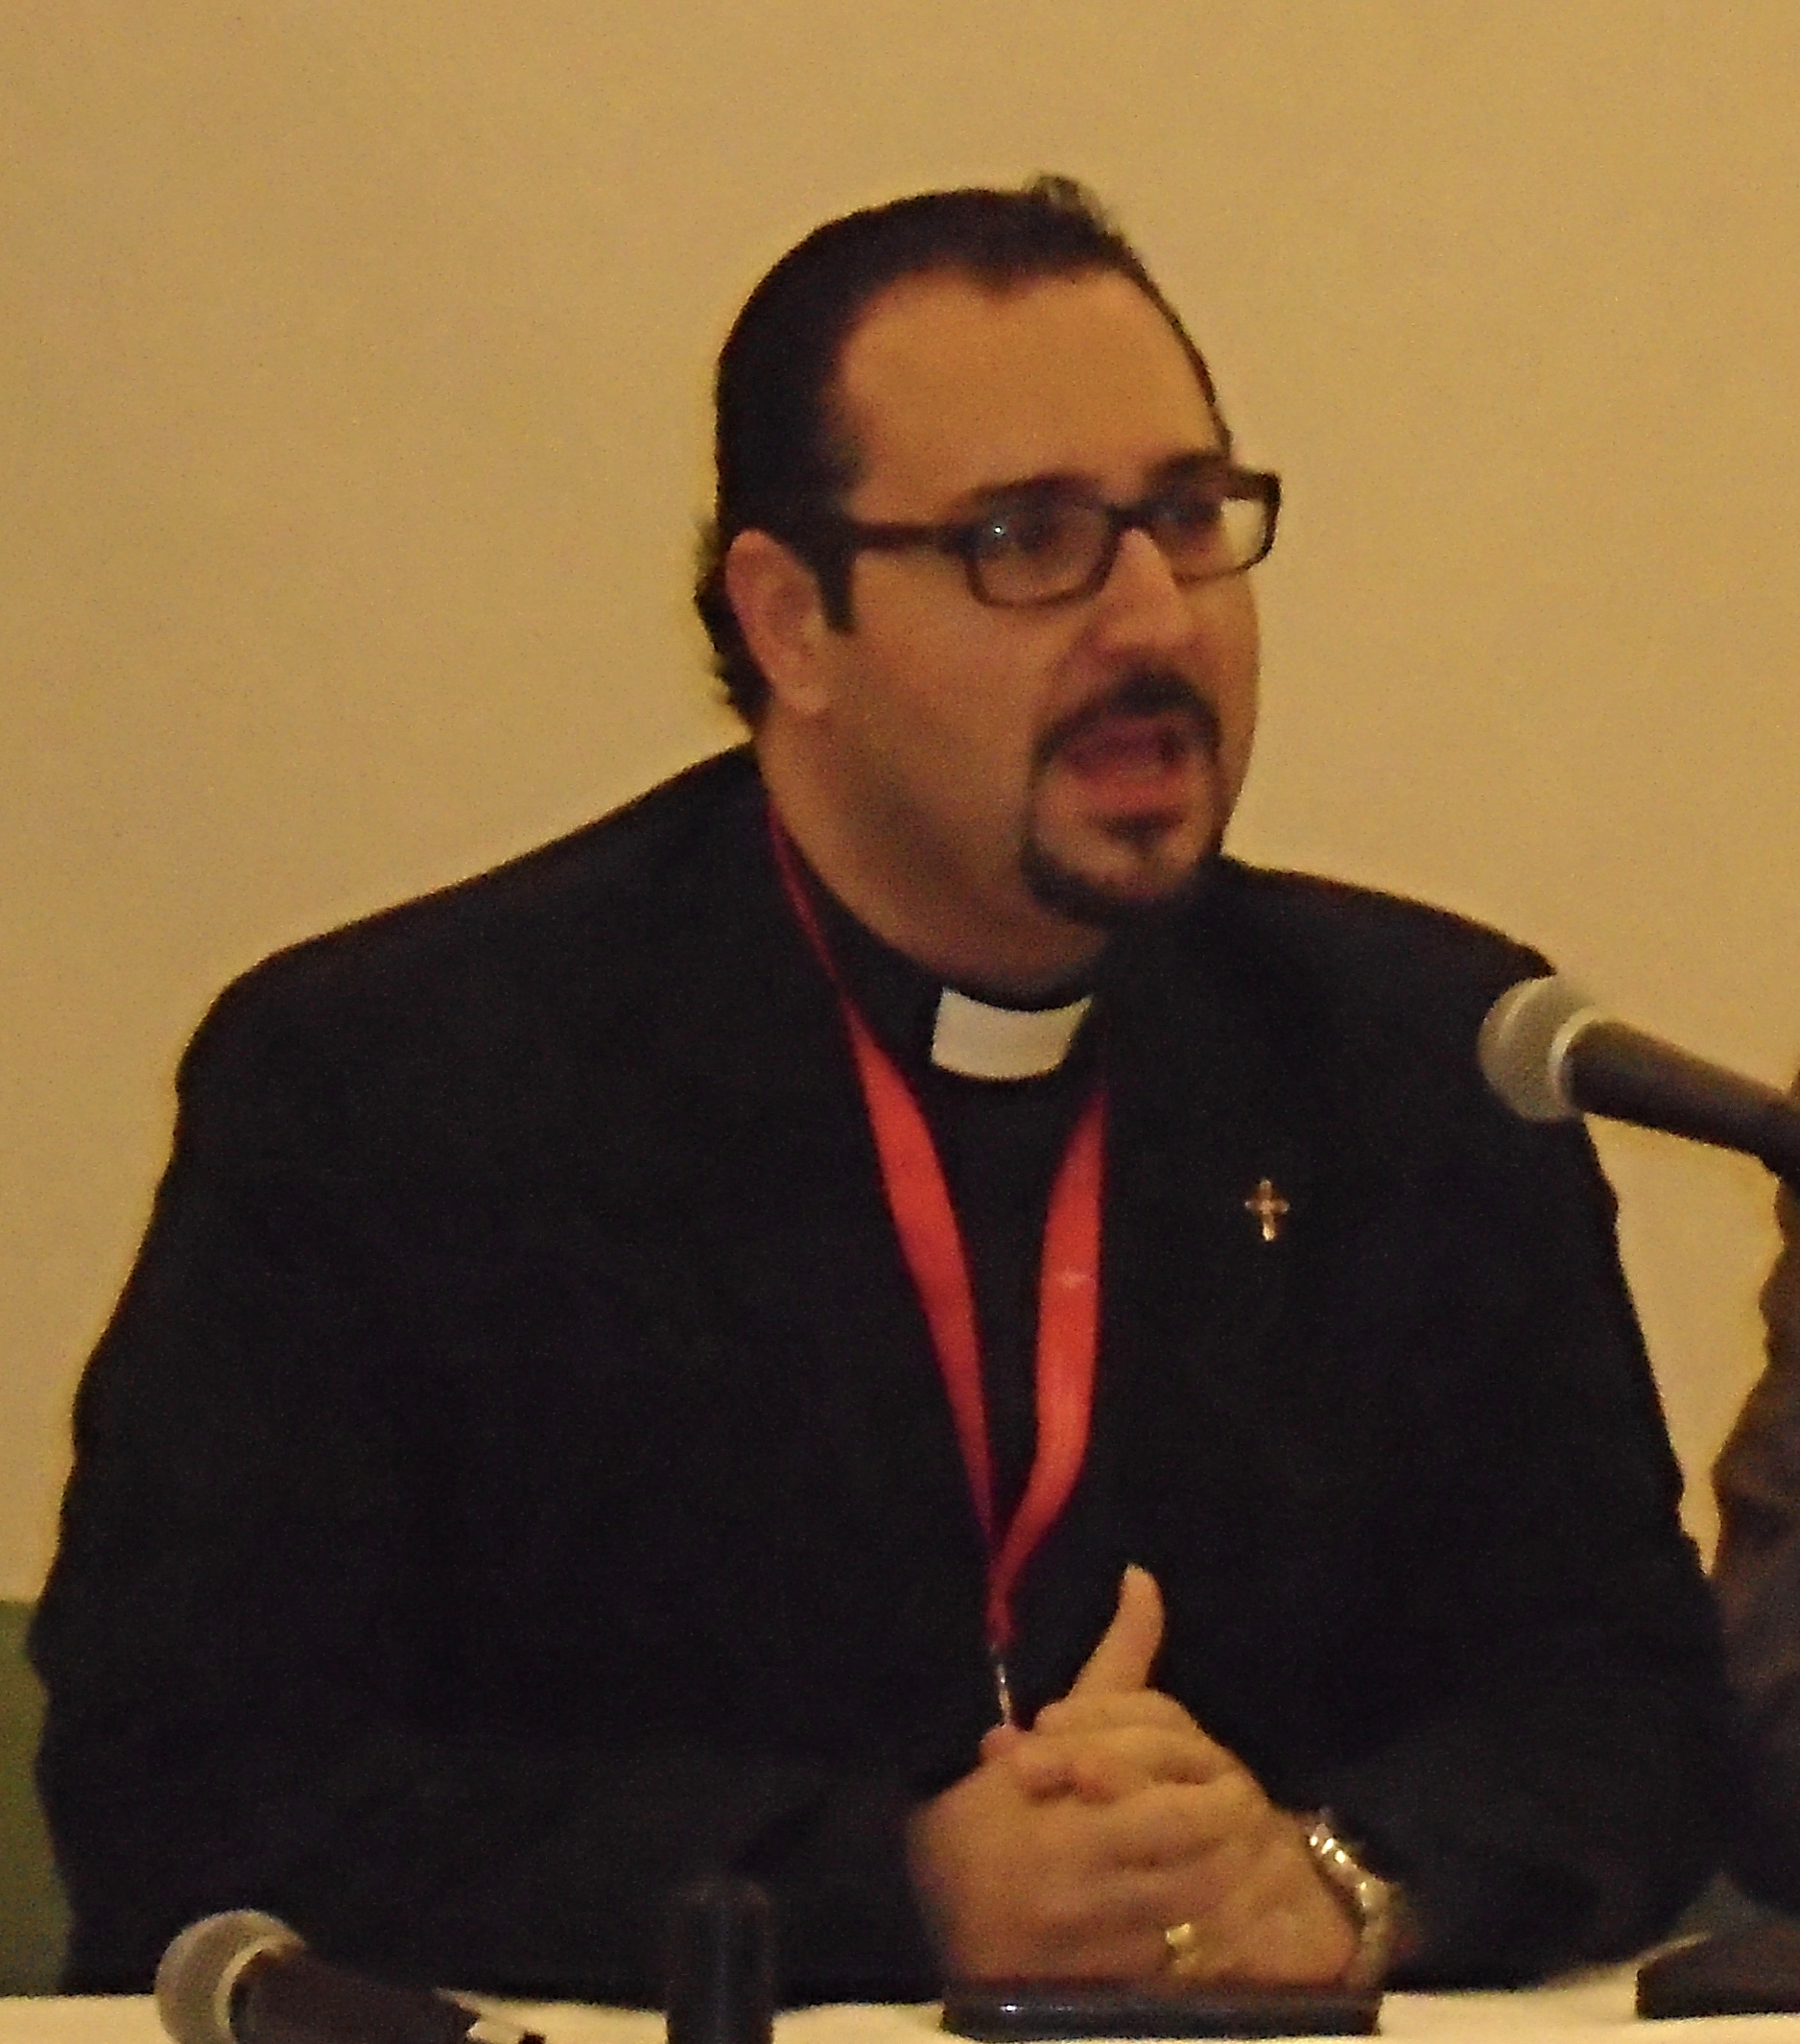 Rev. Jacob Sabbaagh, pastor of the church in Fairouzeh